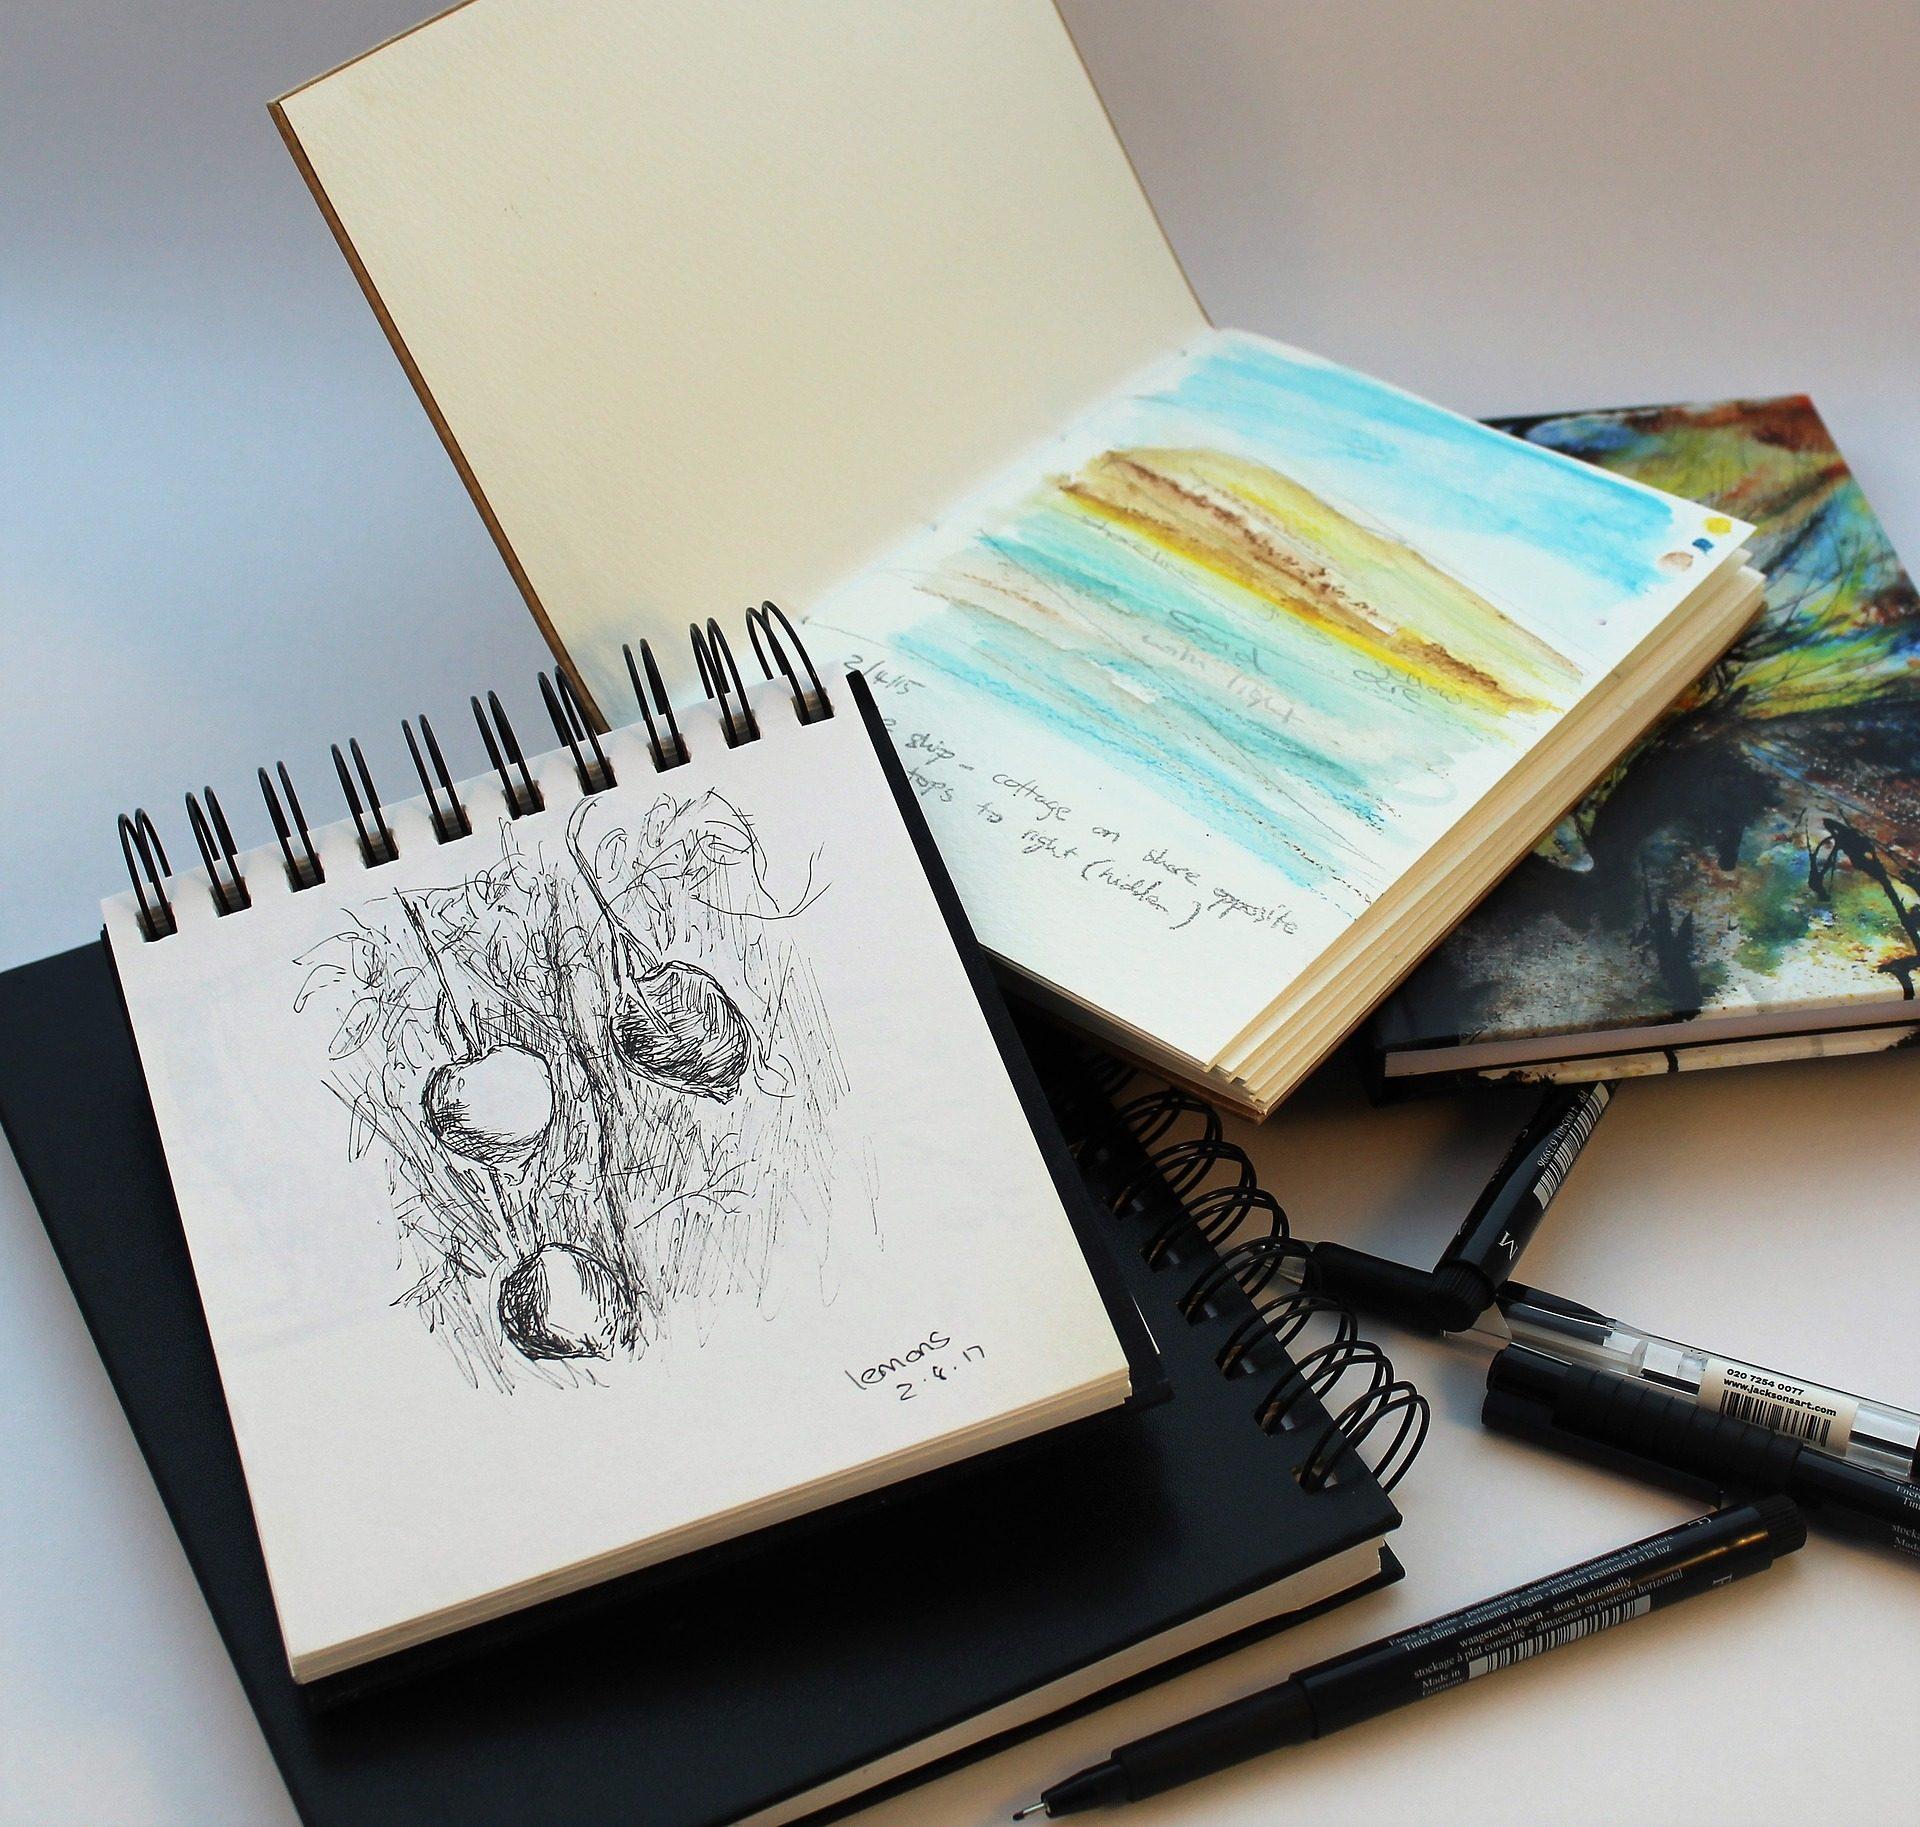 libretas, Notebook, schizzi, disegni, pennarelli - Sfondi HD - Professor-falken.com